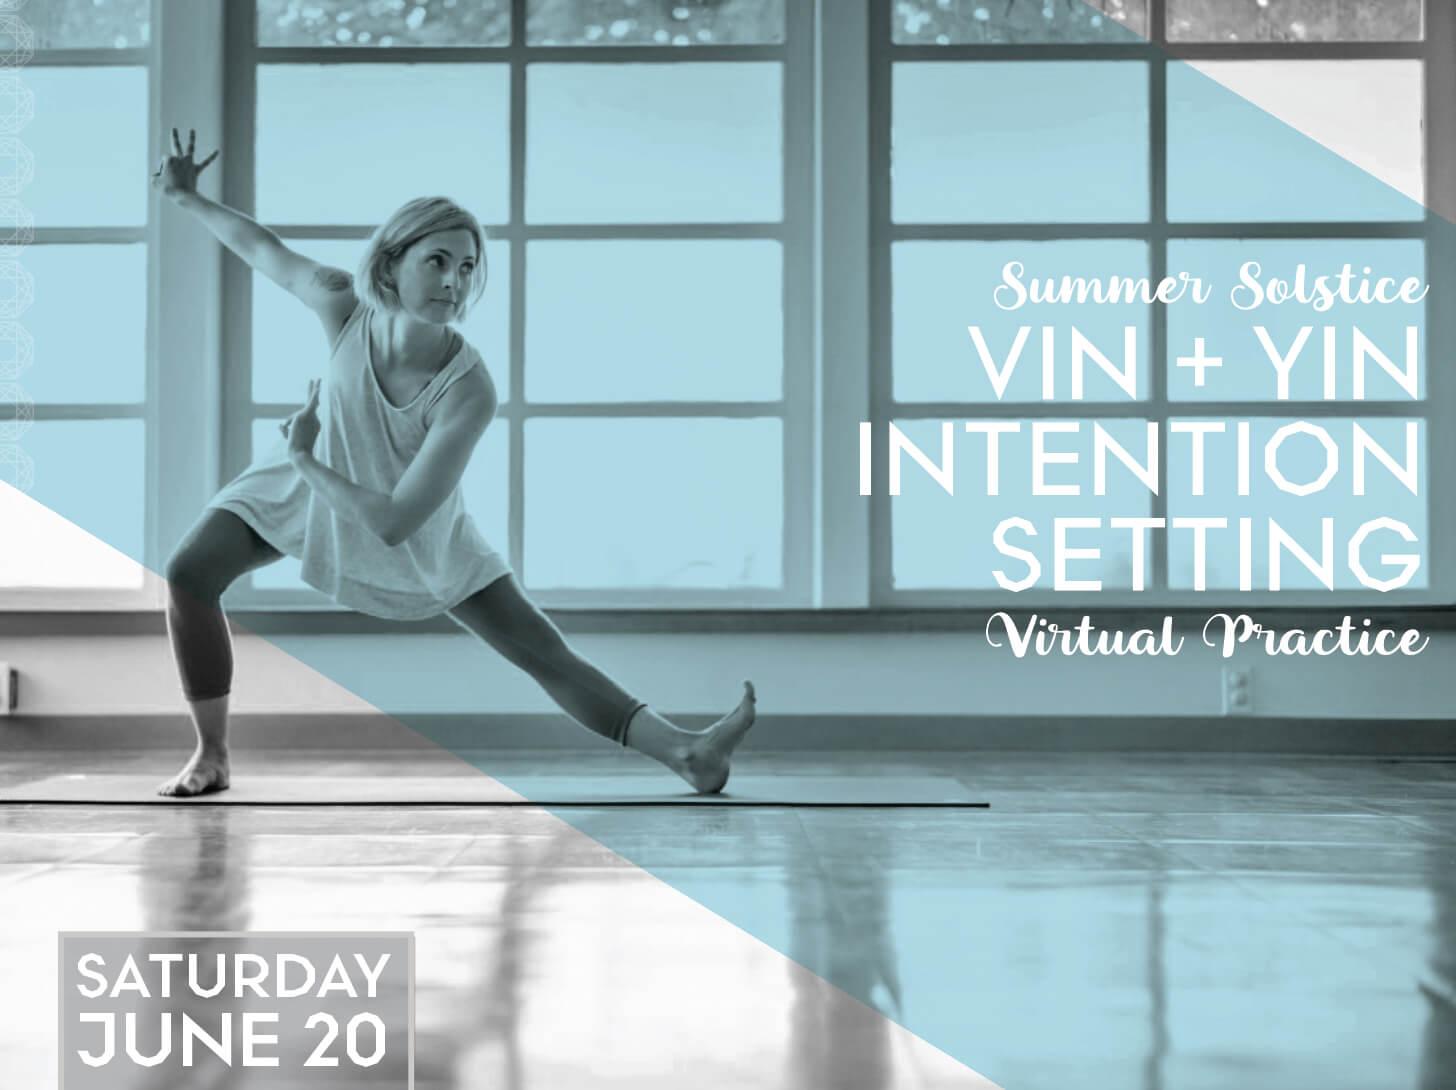 Vin + Yin Intention Setting: Virtual Practice